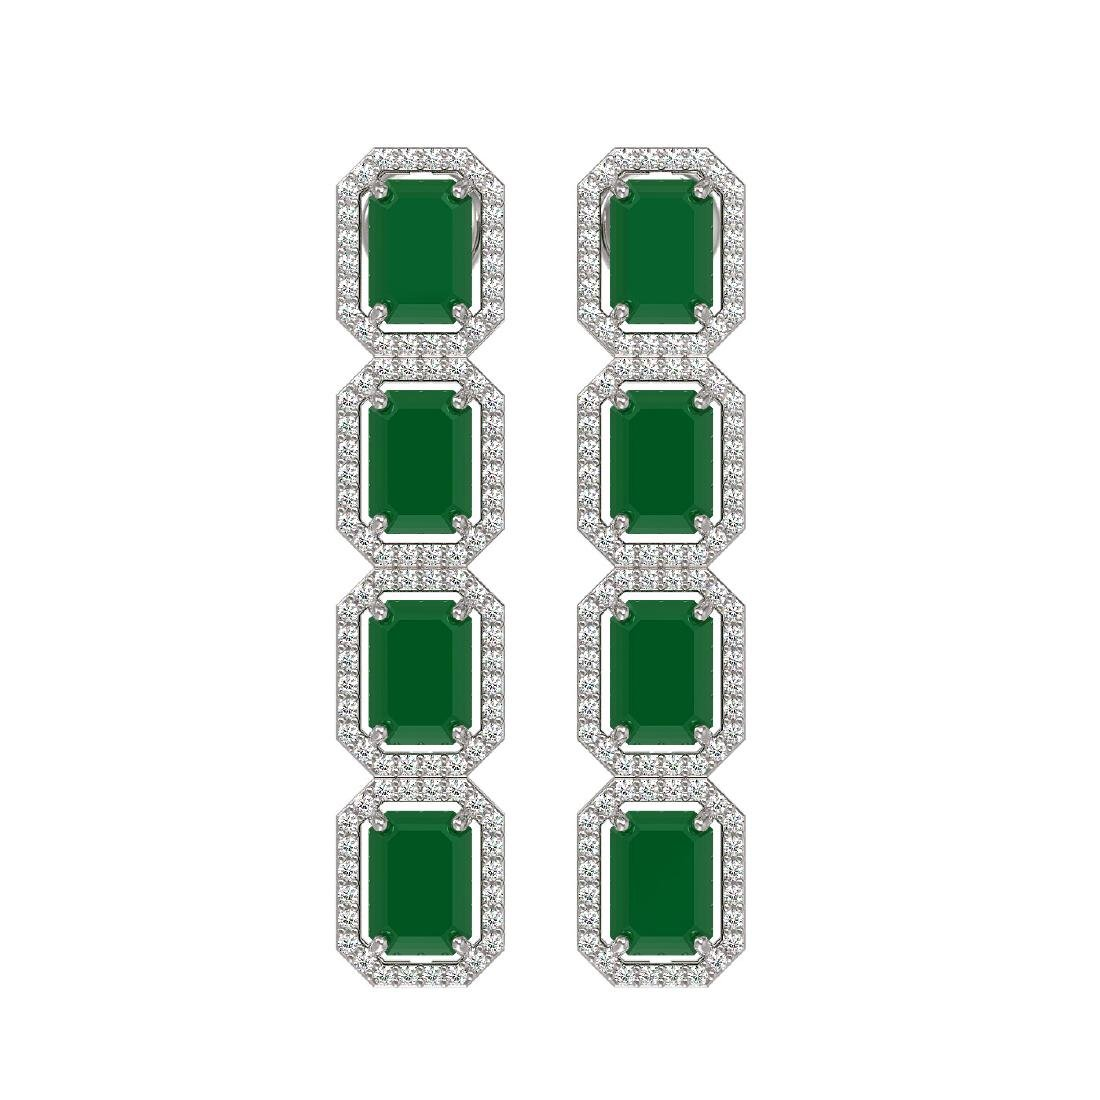 12.33 CTW Emerald & Diamond Halo Earrings 10K White